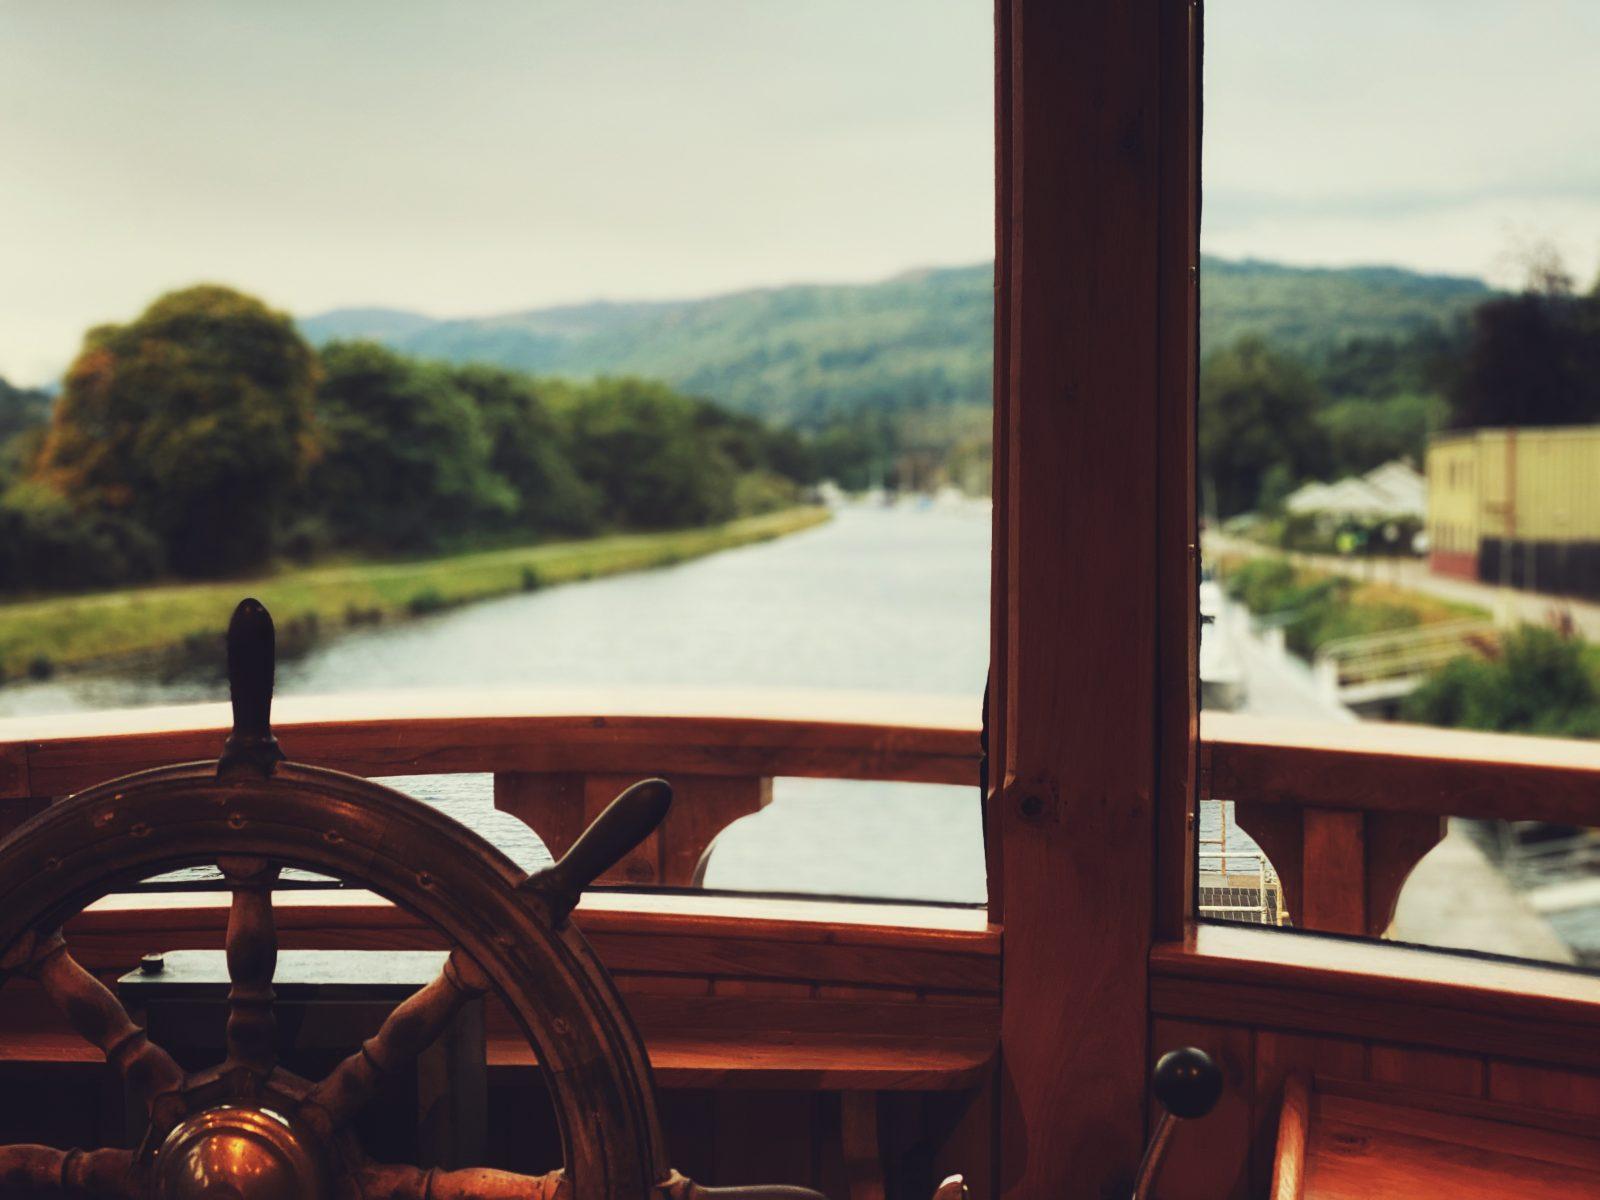 Highland Lassie boat